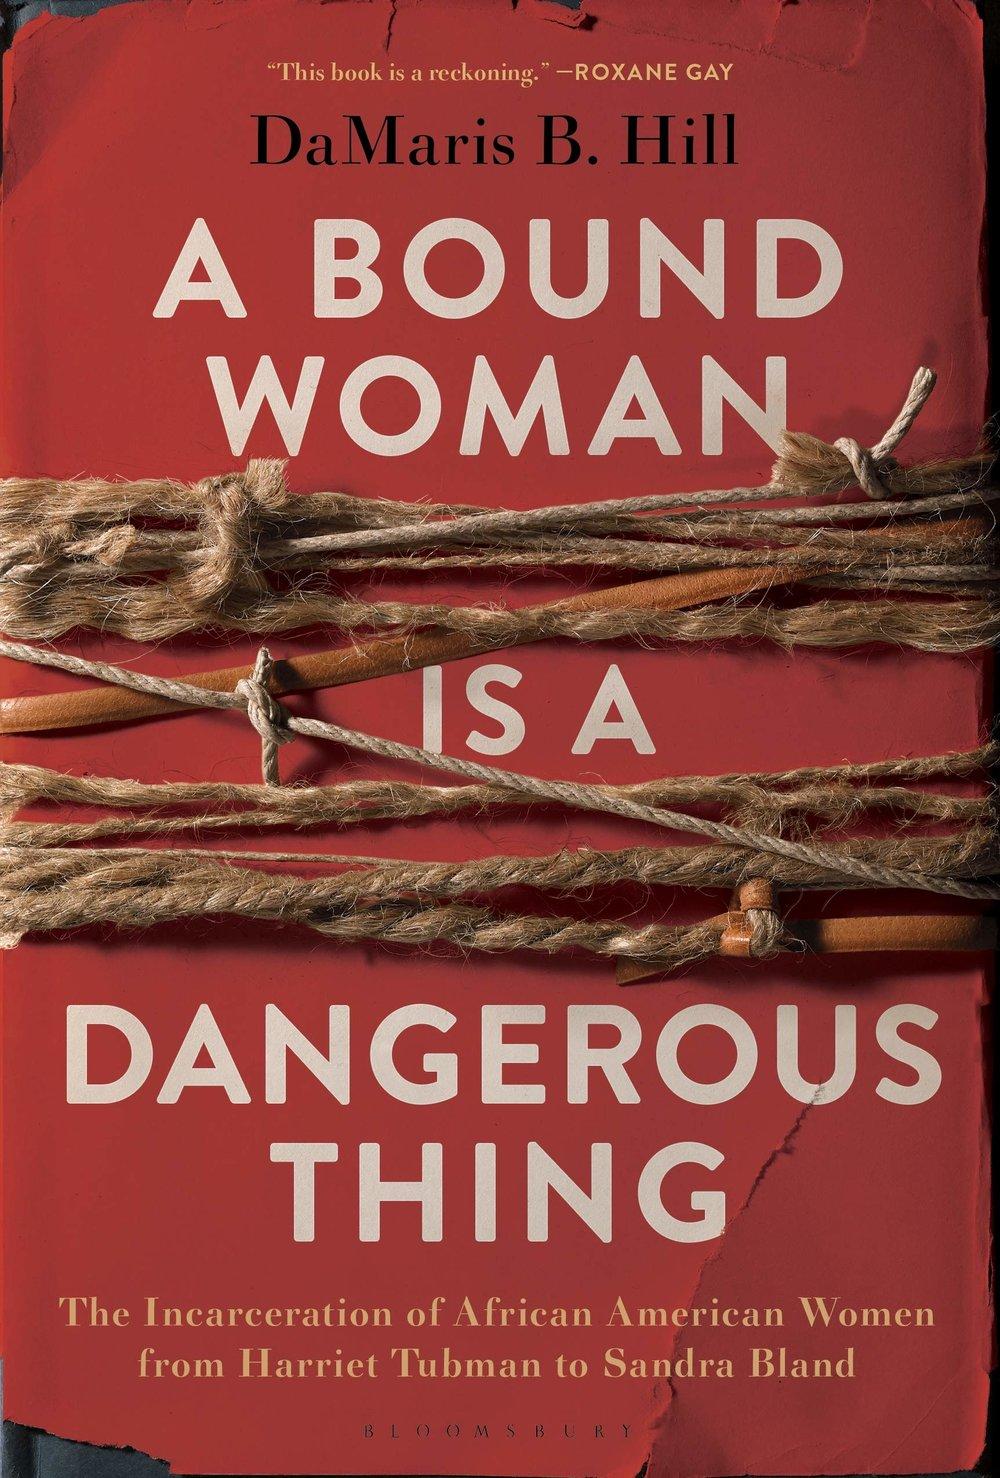 a bound woman.jpg